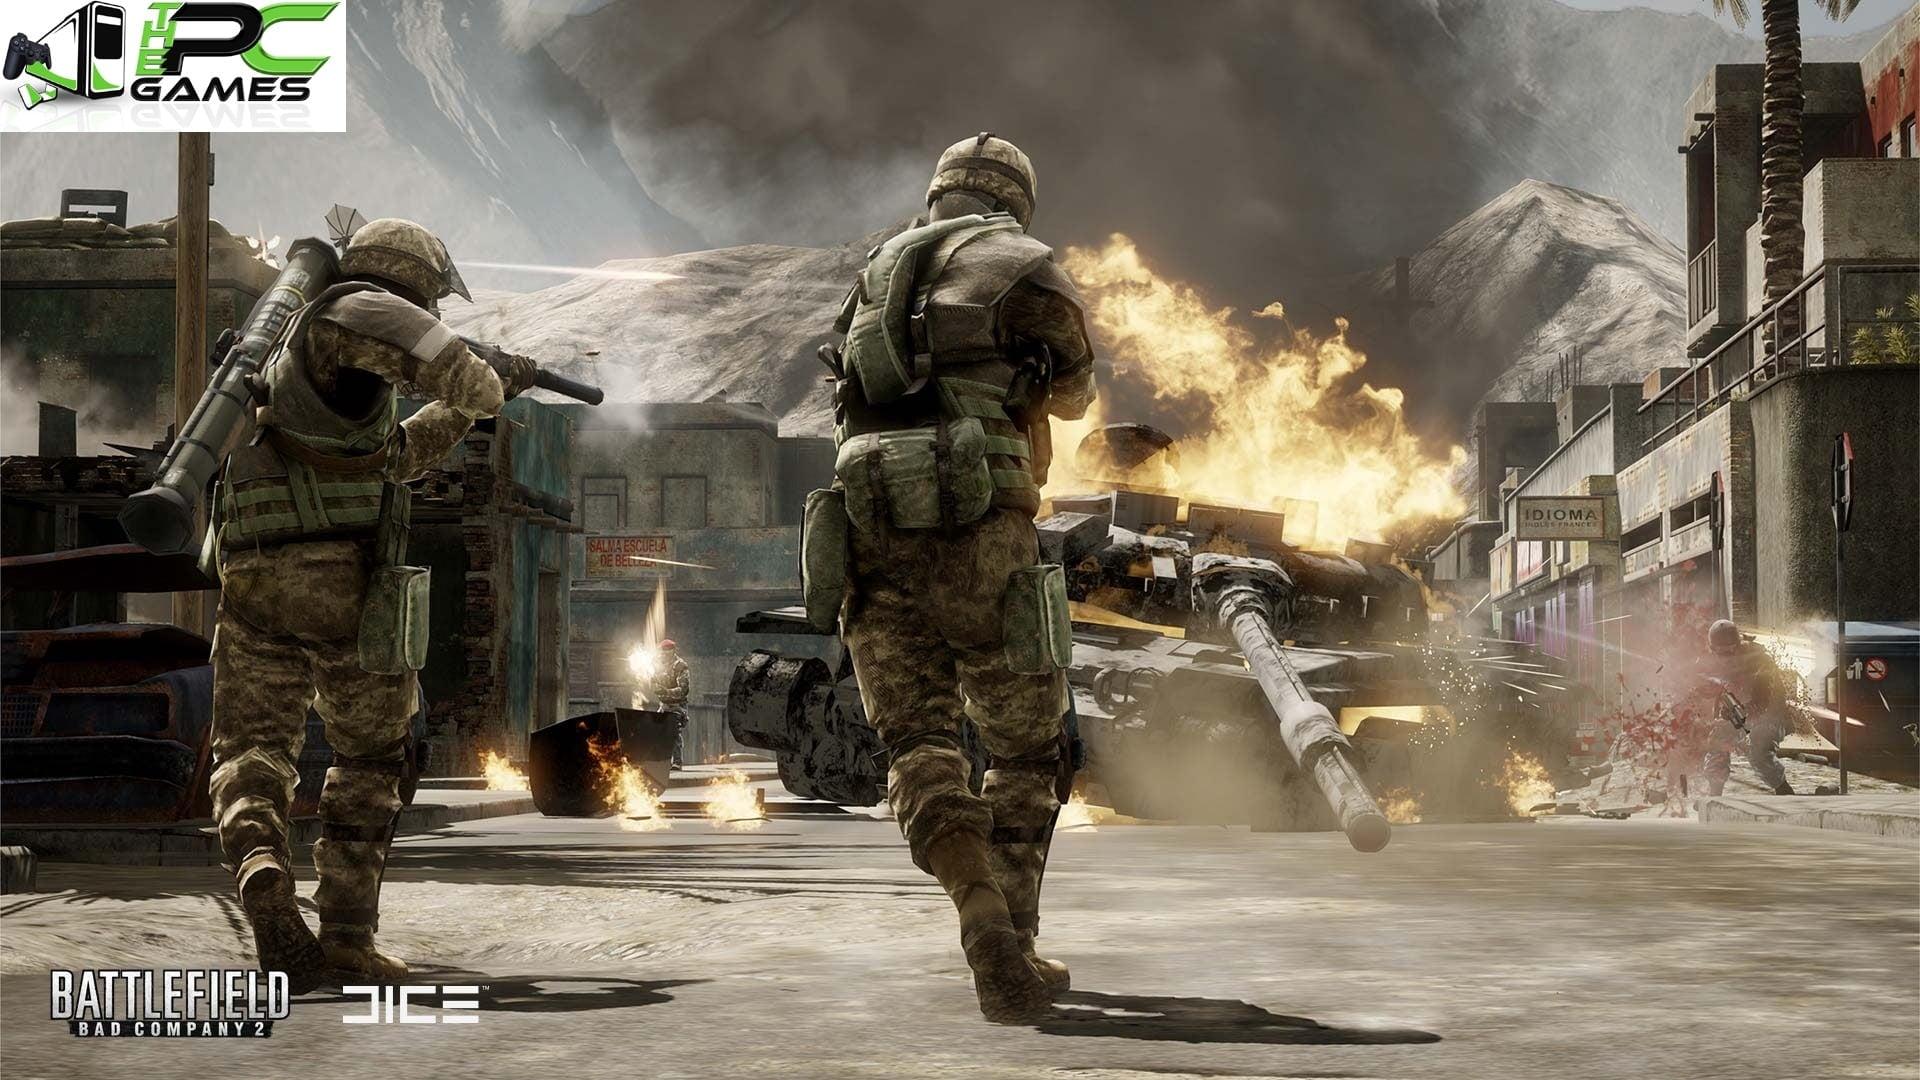 Battlefield Bad Company - EA Official Website